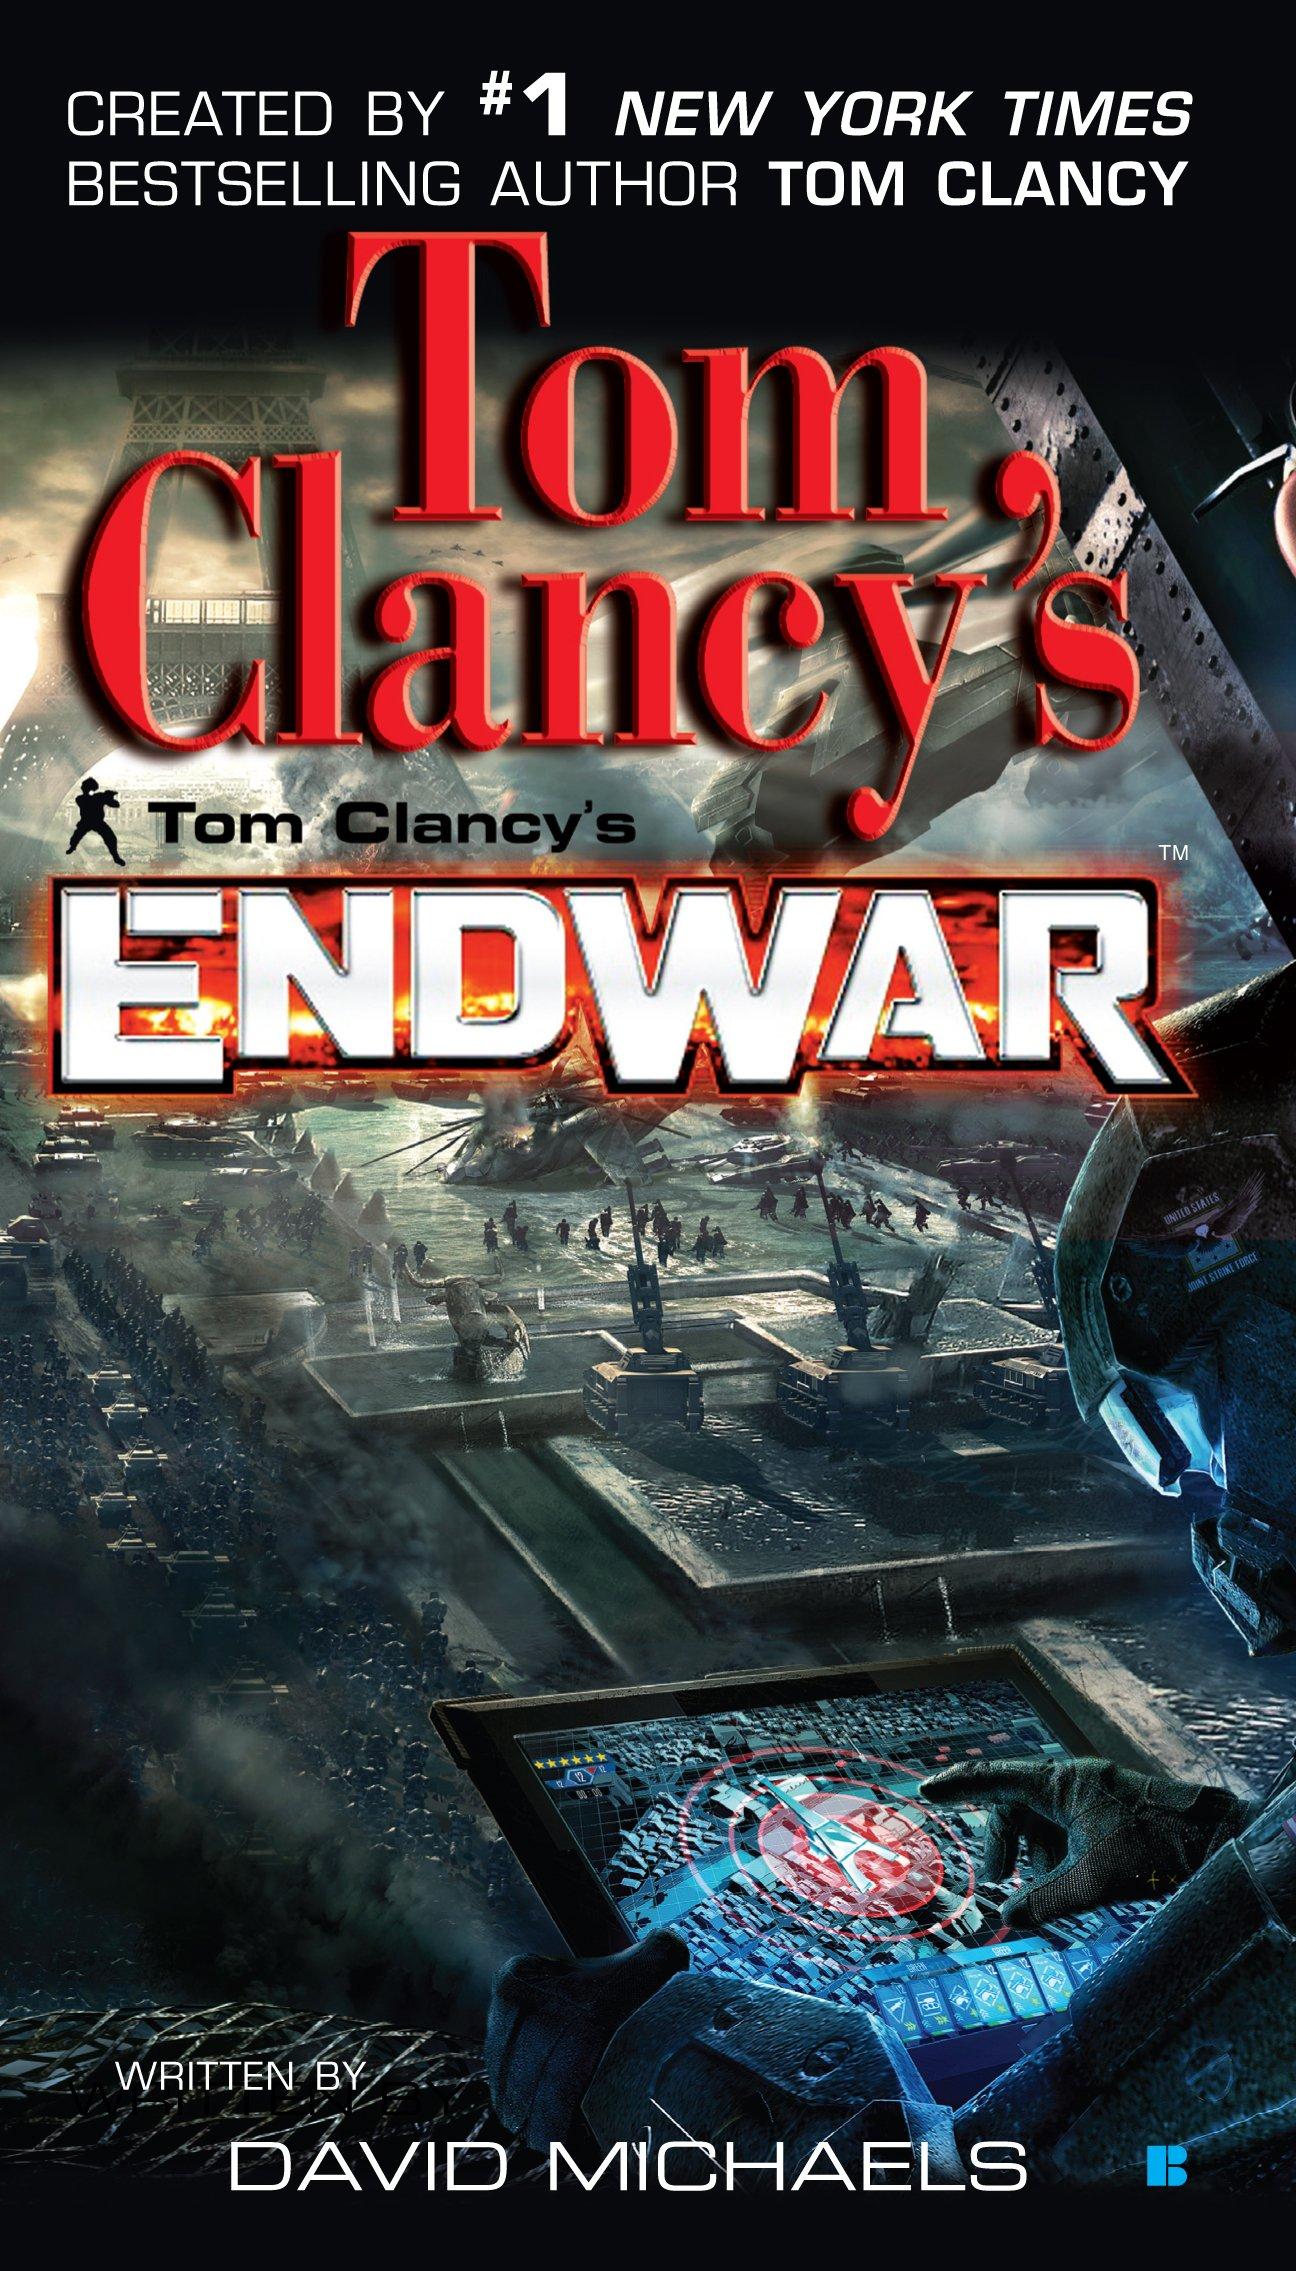 Book Cover Series Wiki : Tom clancy s endwar novel wiki fandom powered